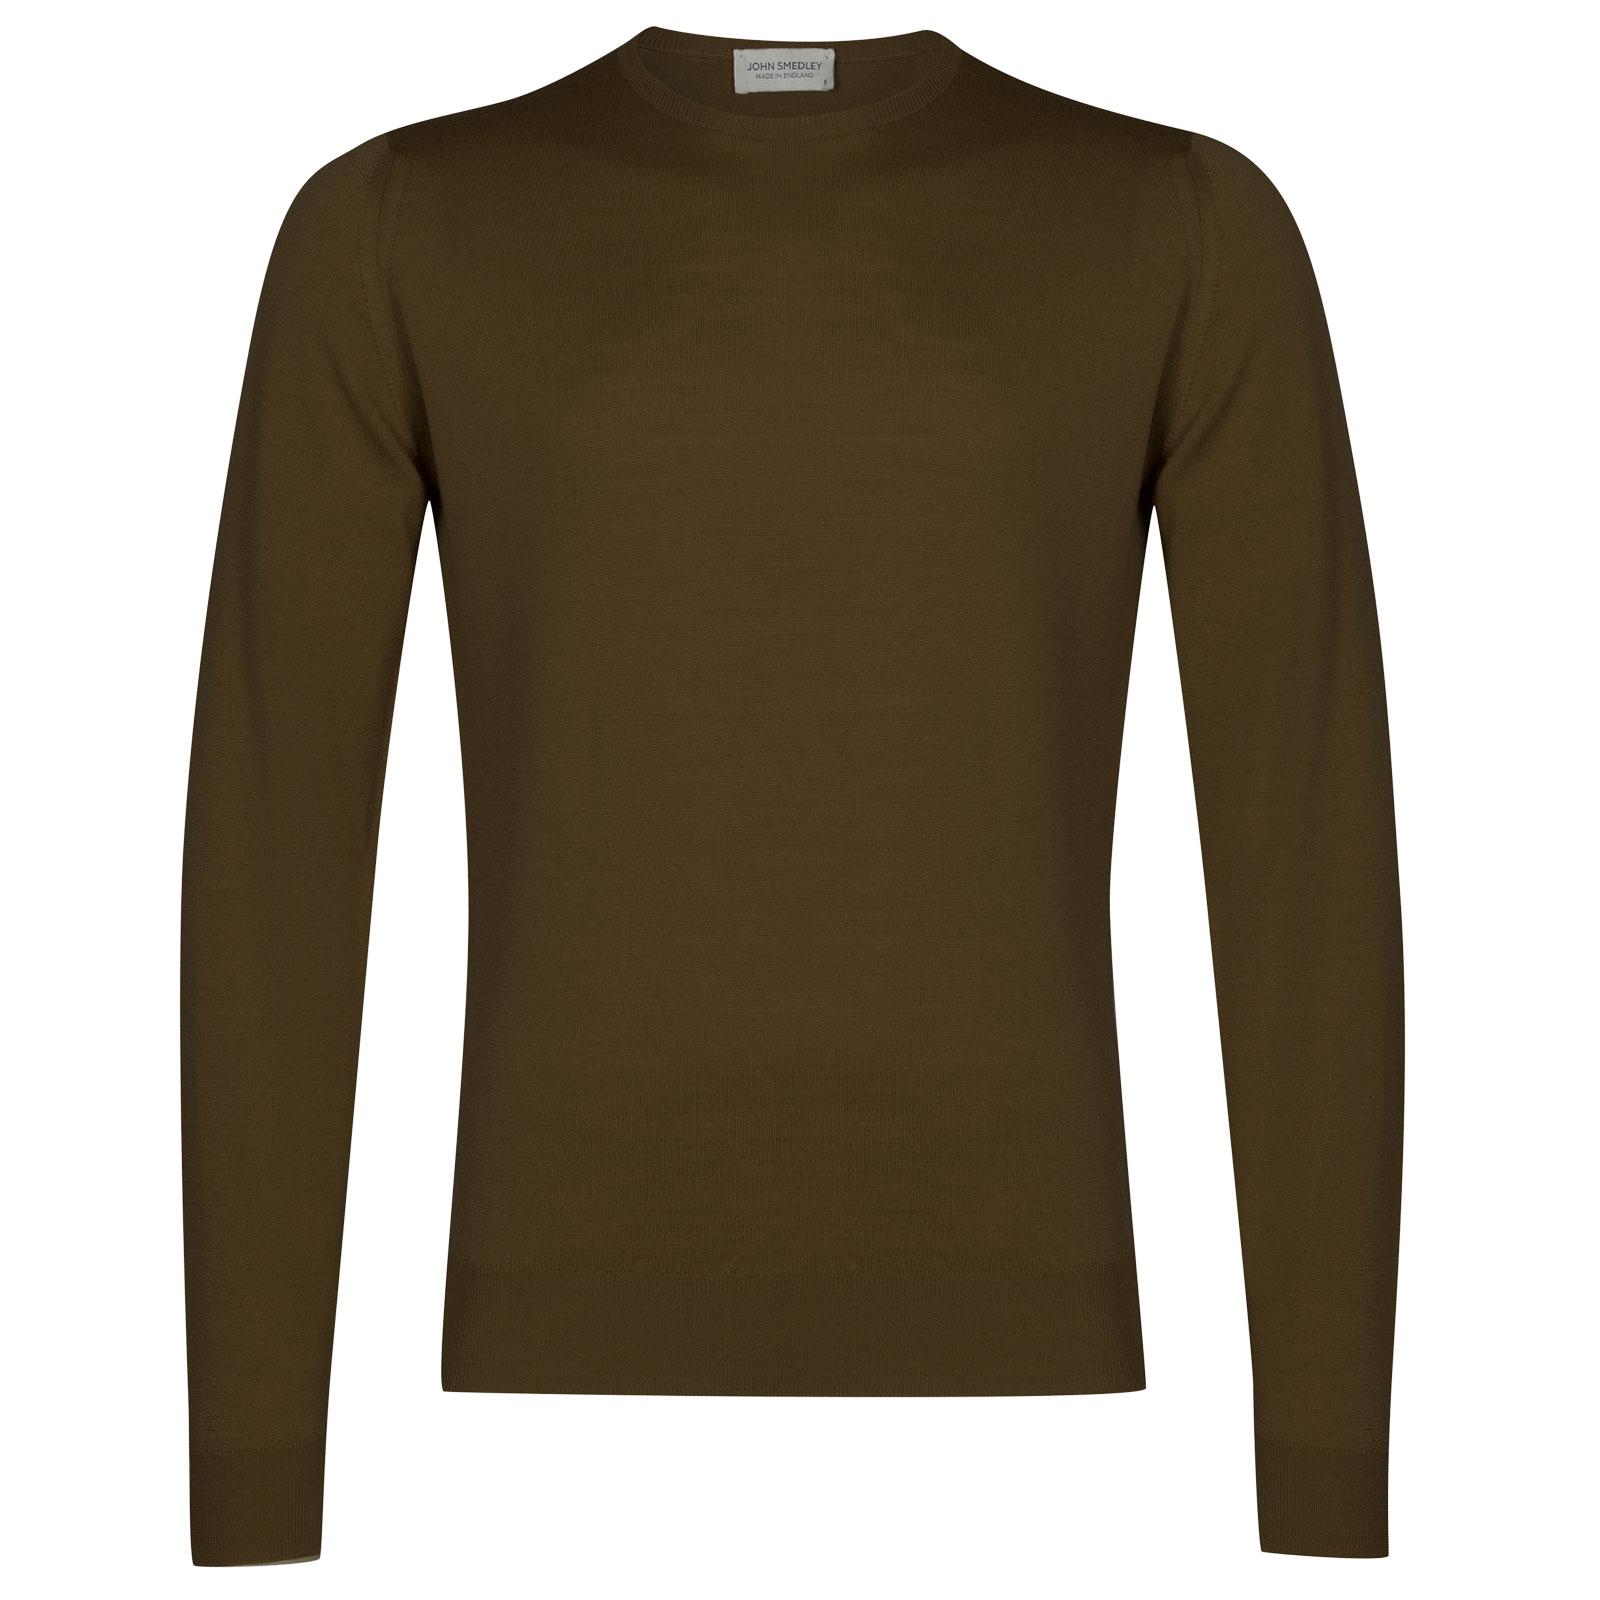 John Smedley lundy Merino Wool Pullover in Kielder Green-M